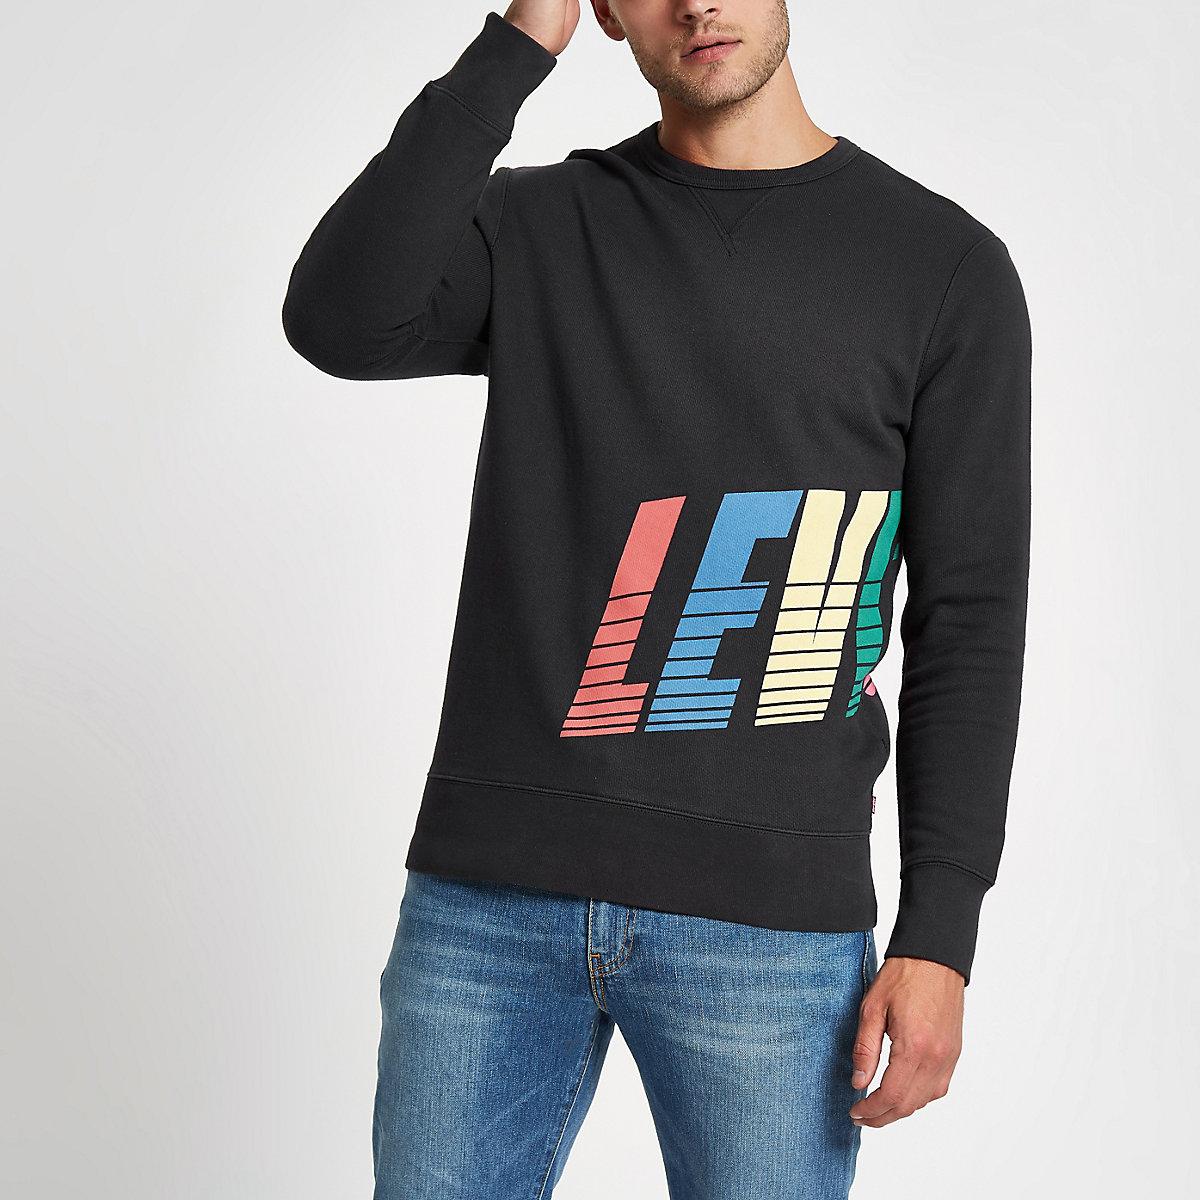 Levi's black graphic print sweatshirt